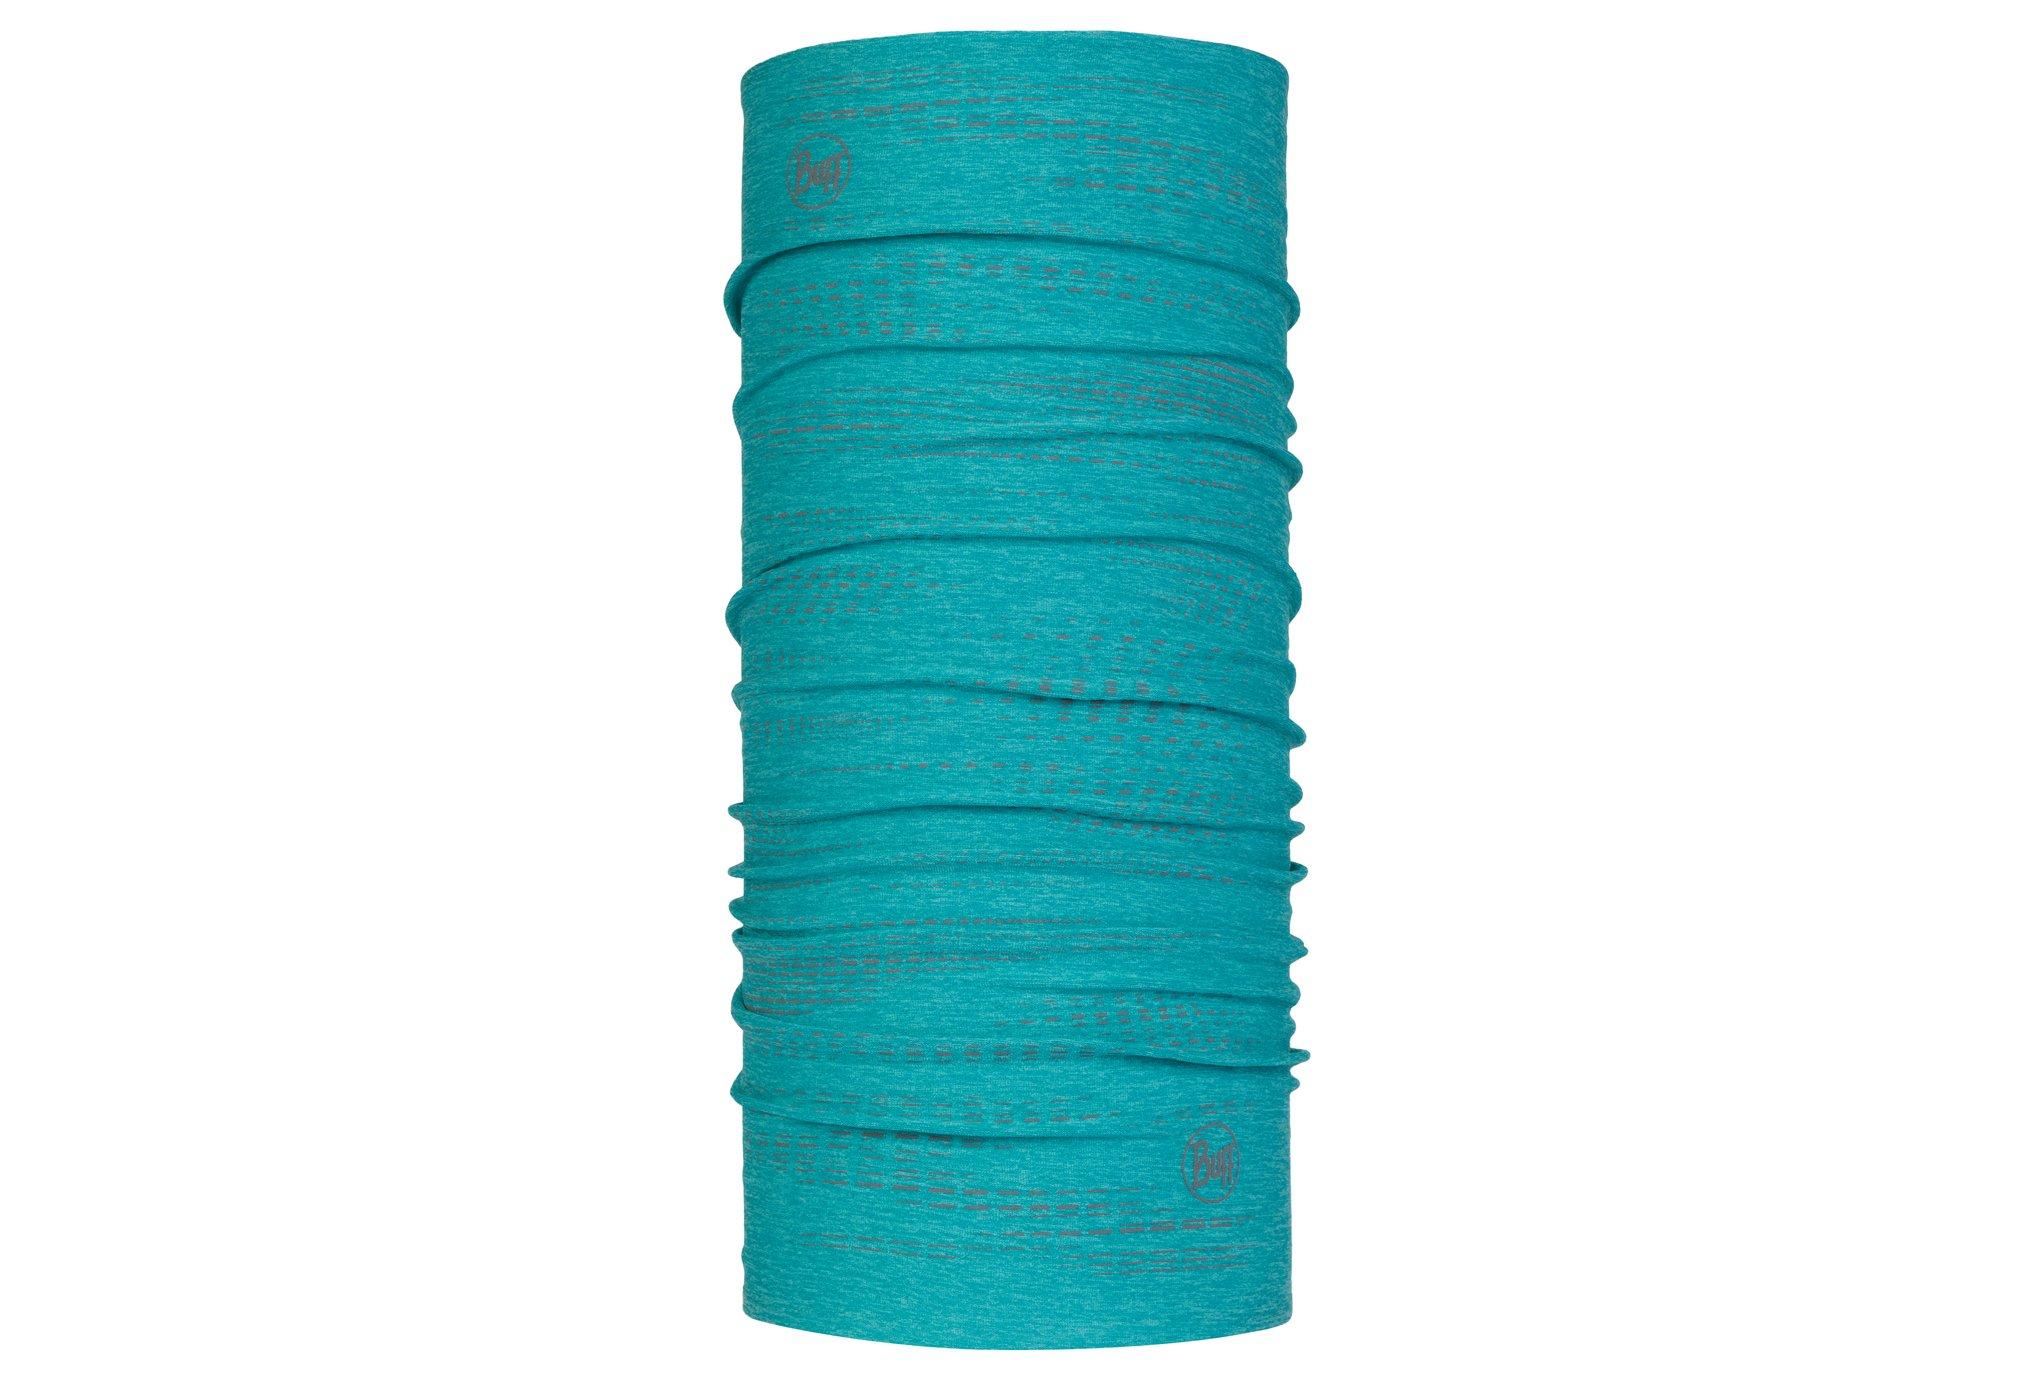 Buff Dryflx r-Turquoise tours de cou